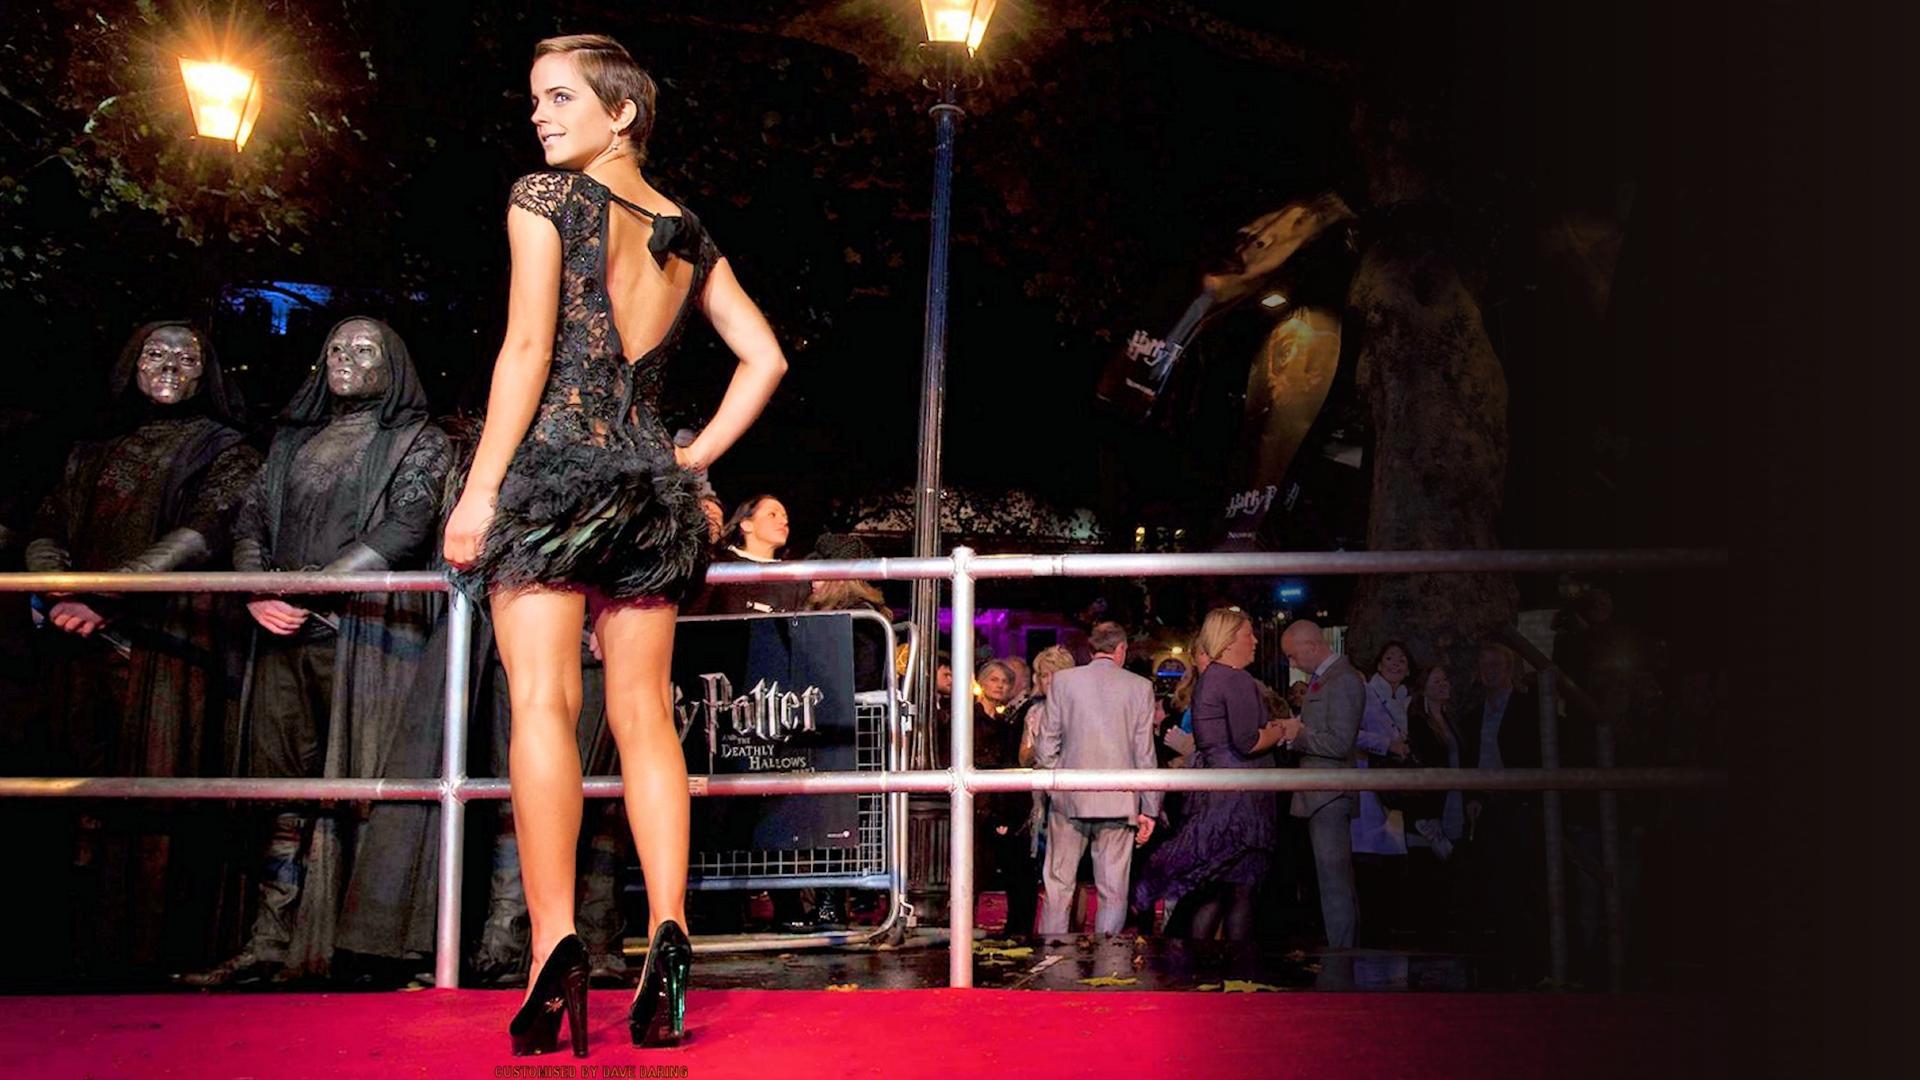 Emma Watson premier by Dave-Daring